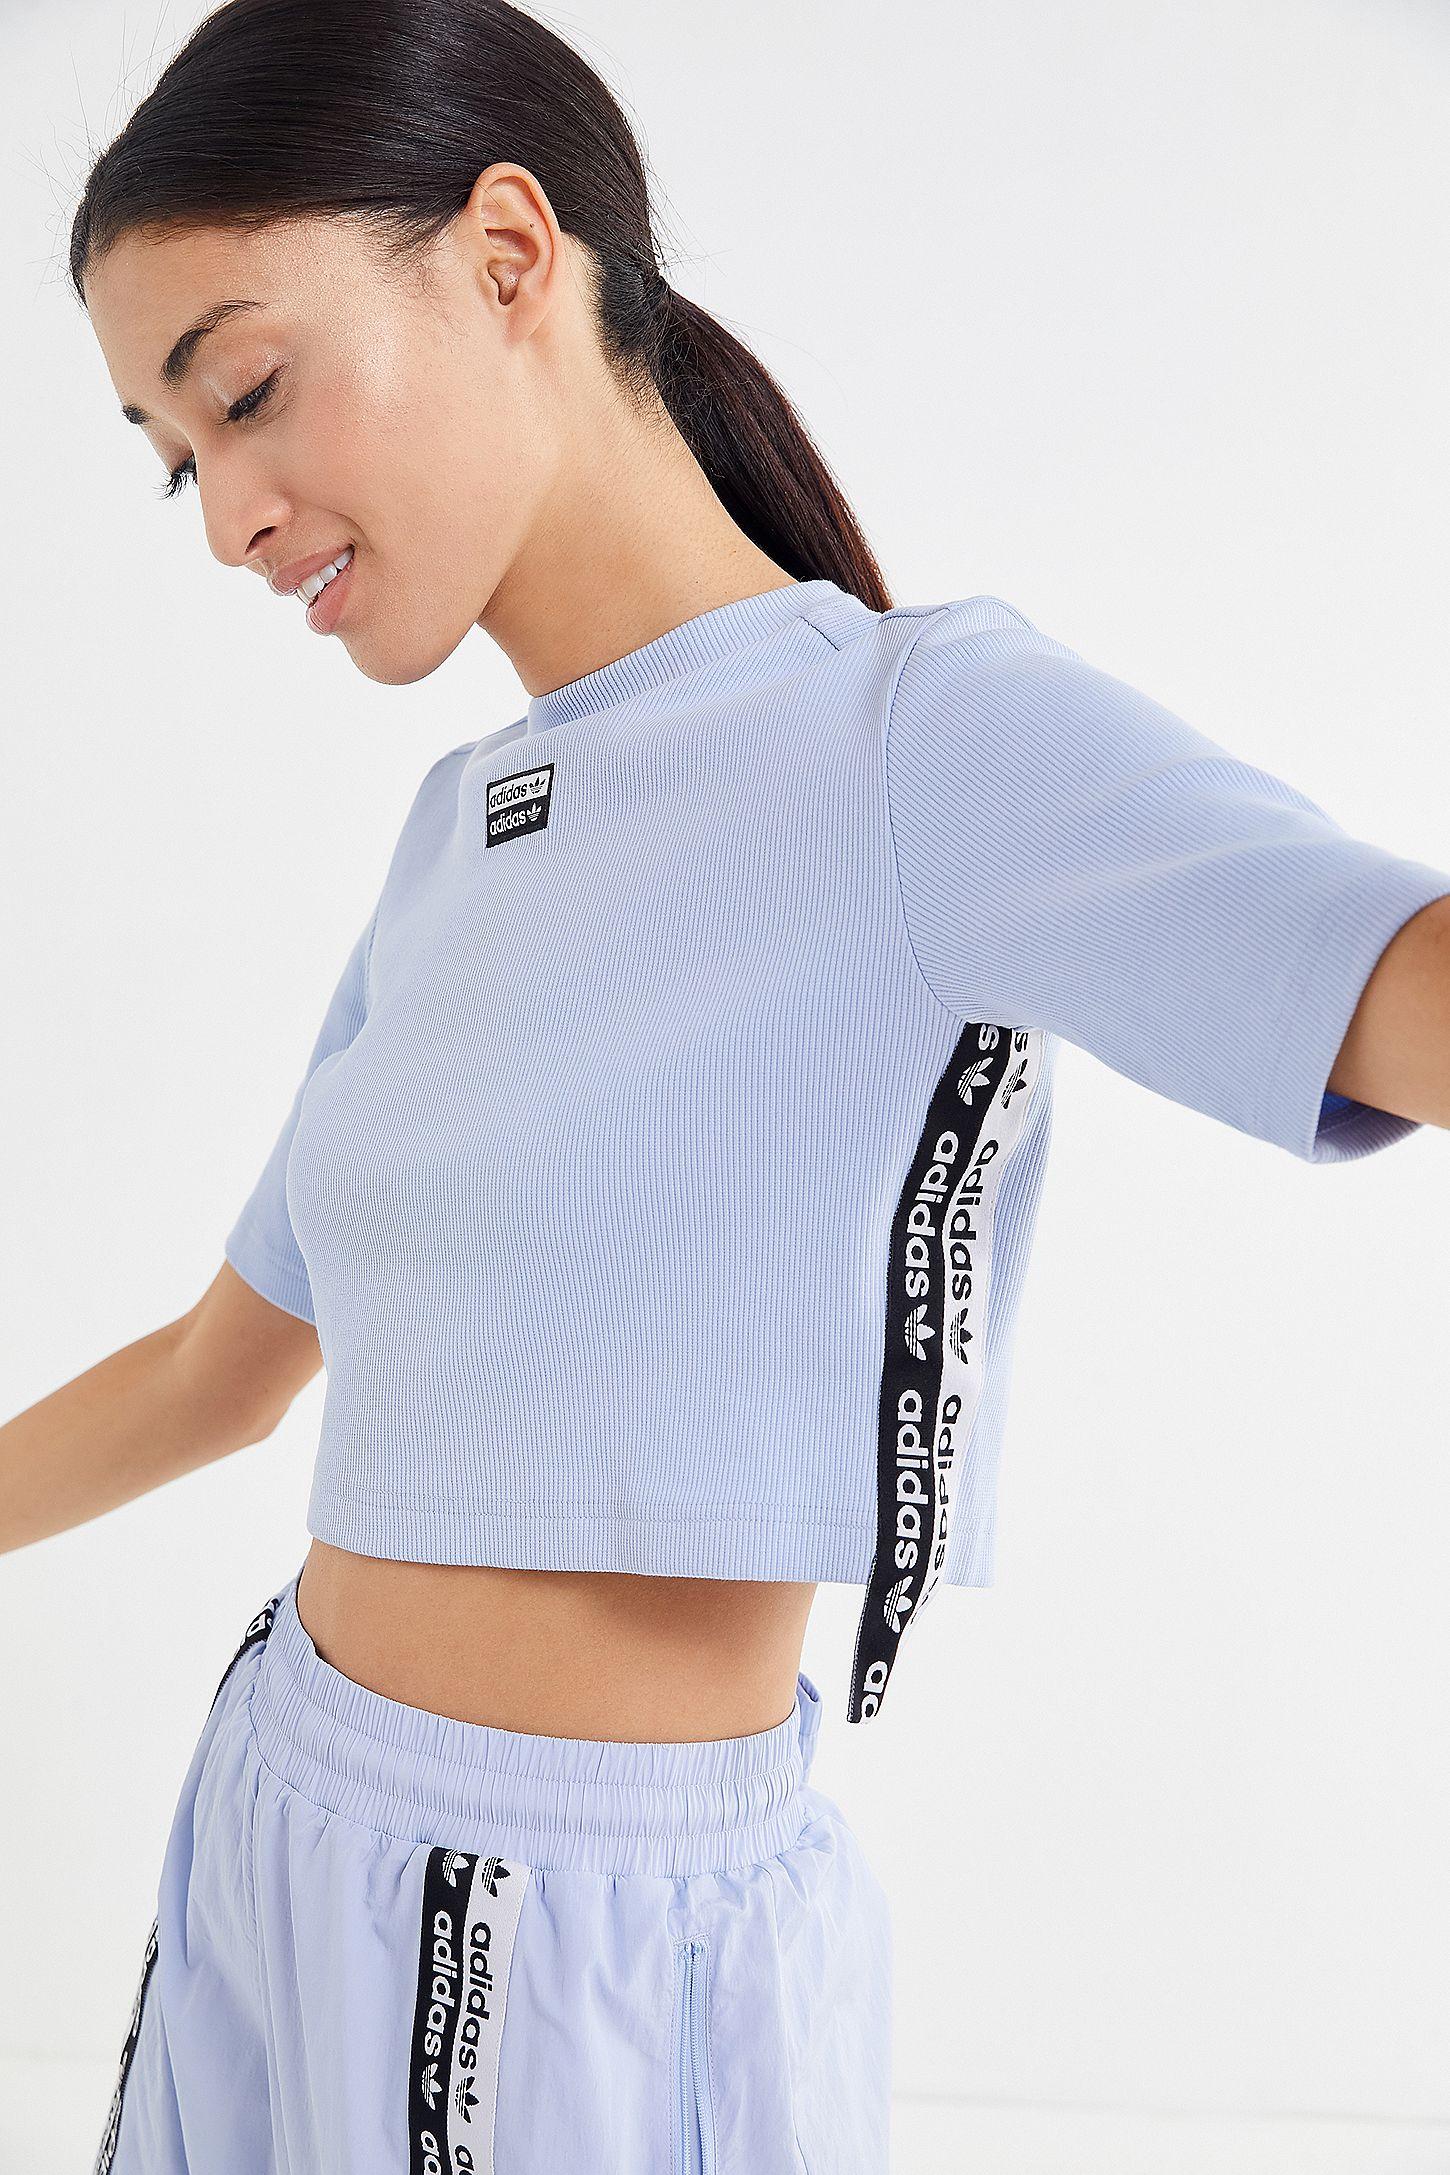 af74472583b adidas Originals Reveal Your Voice Ribbed Logo Tape Crop T-Shirt ...